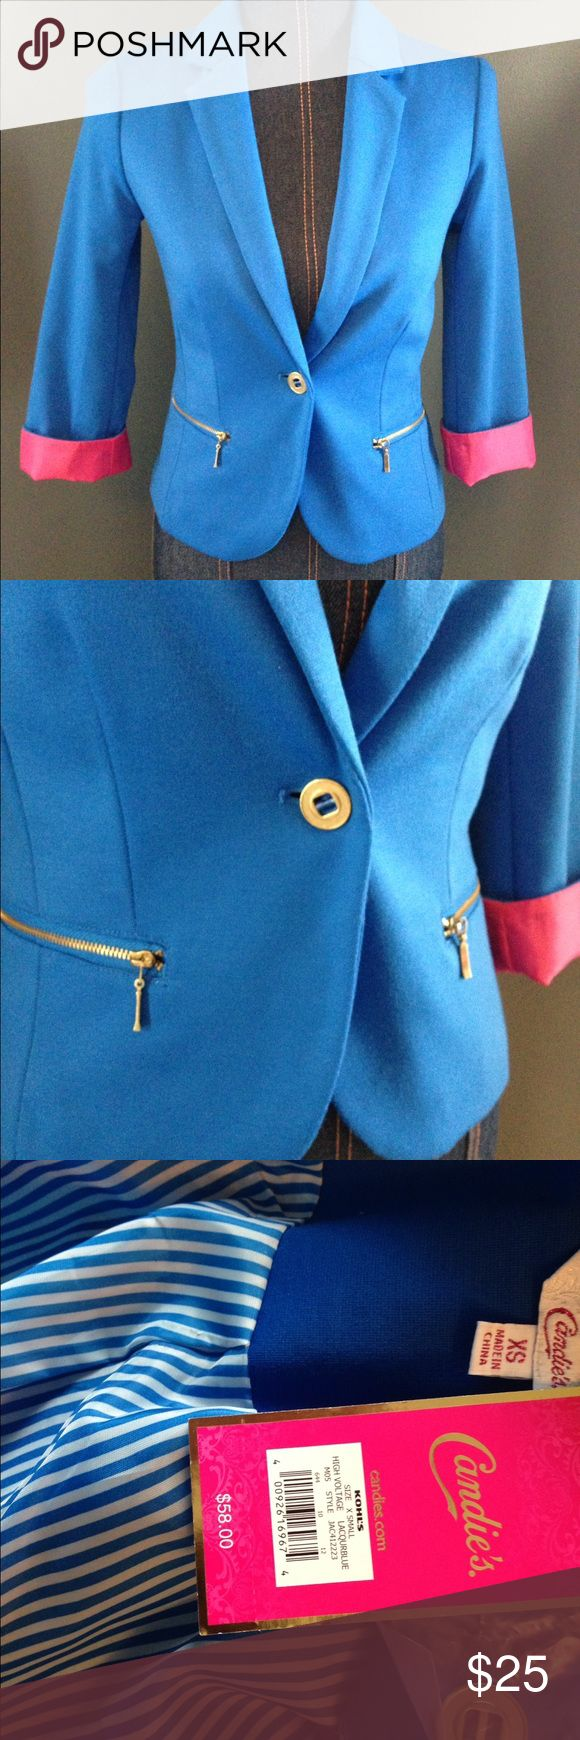 Royal Blue Blazer Beautiful blue blazer. Super cute pink cuffs. Candie's Jackets & Coats Blazers